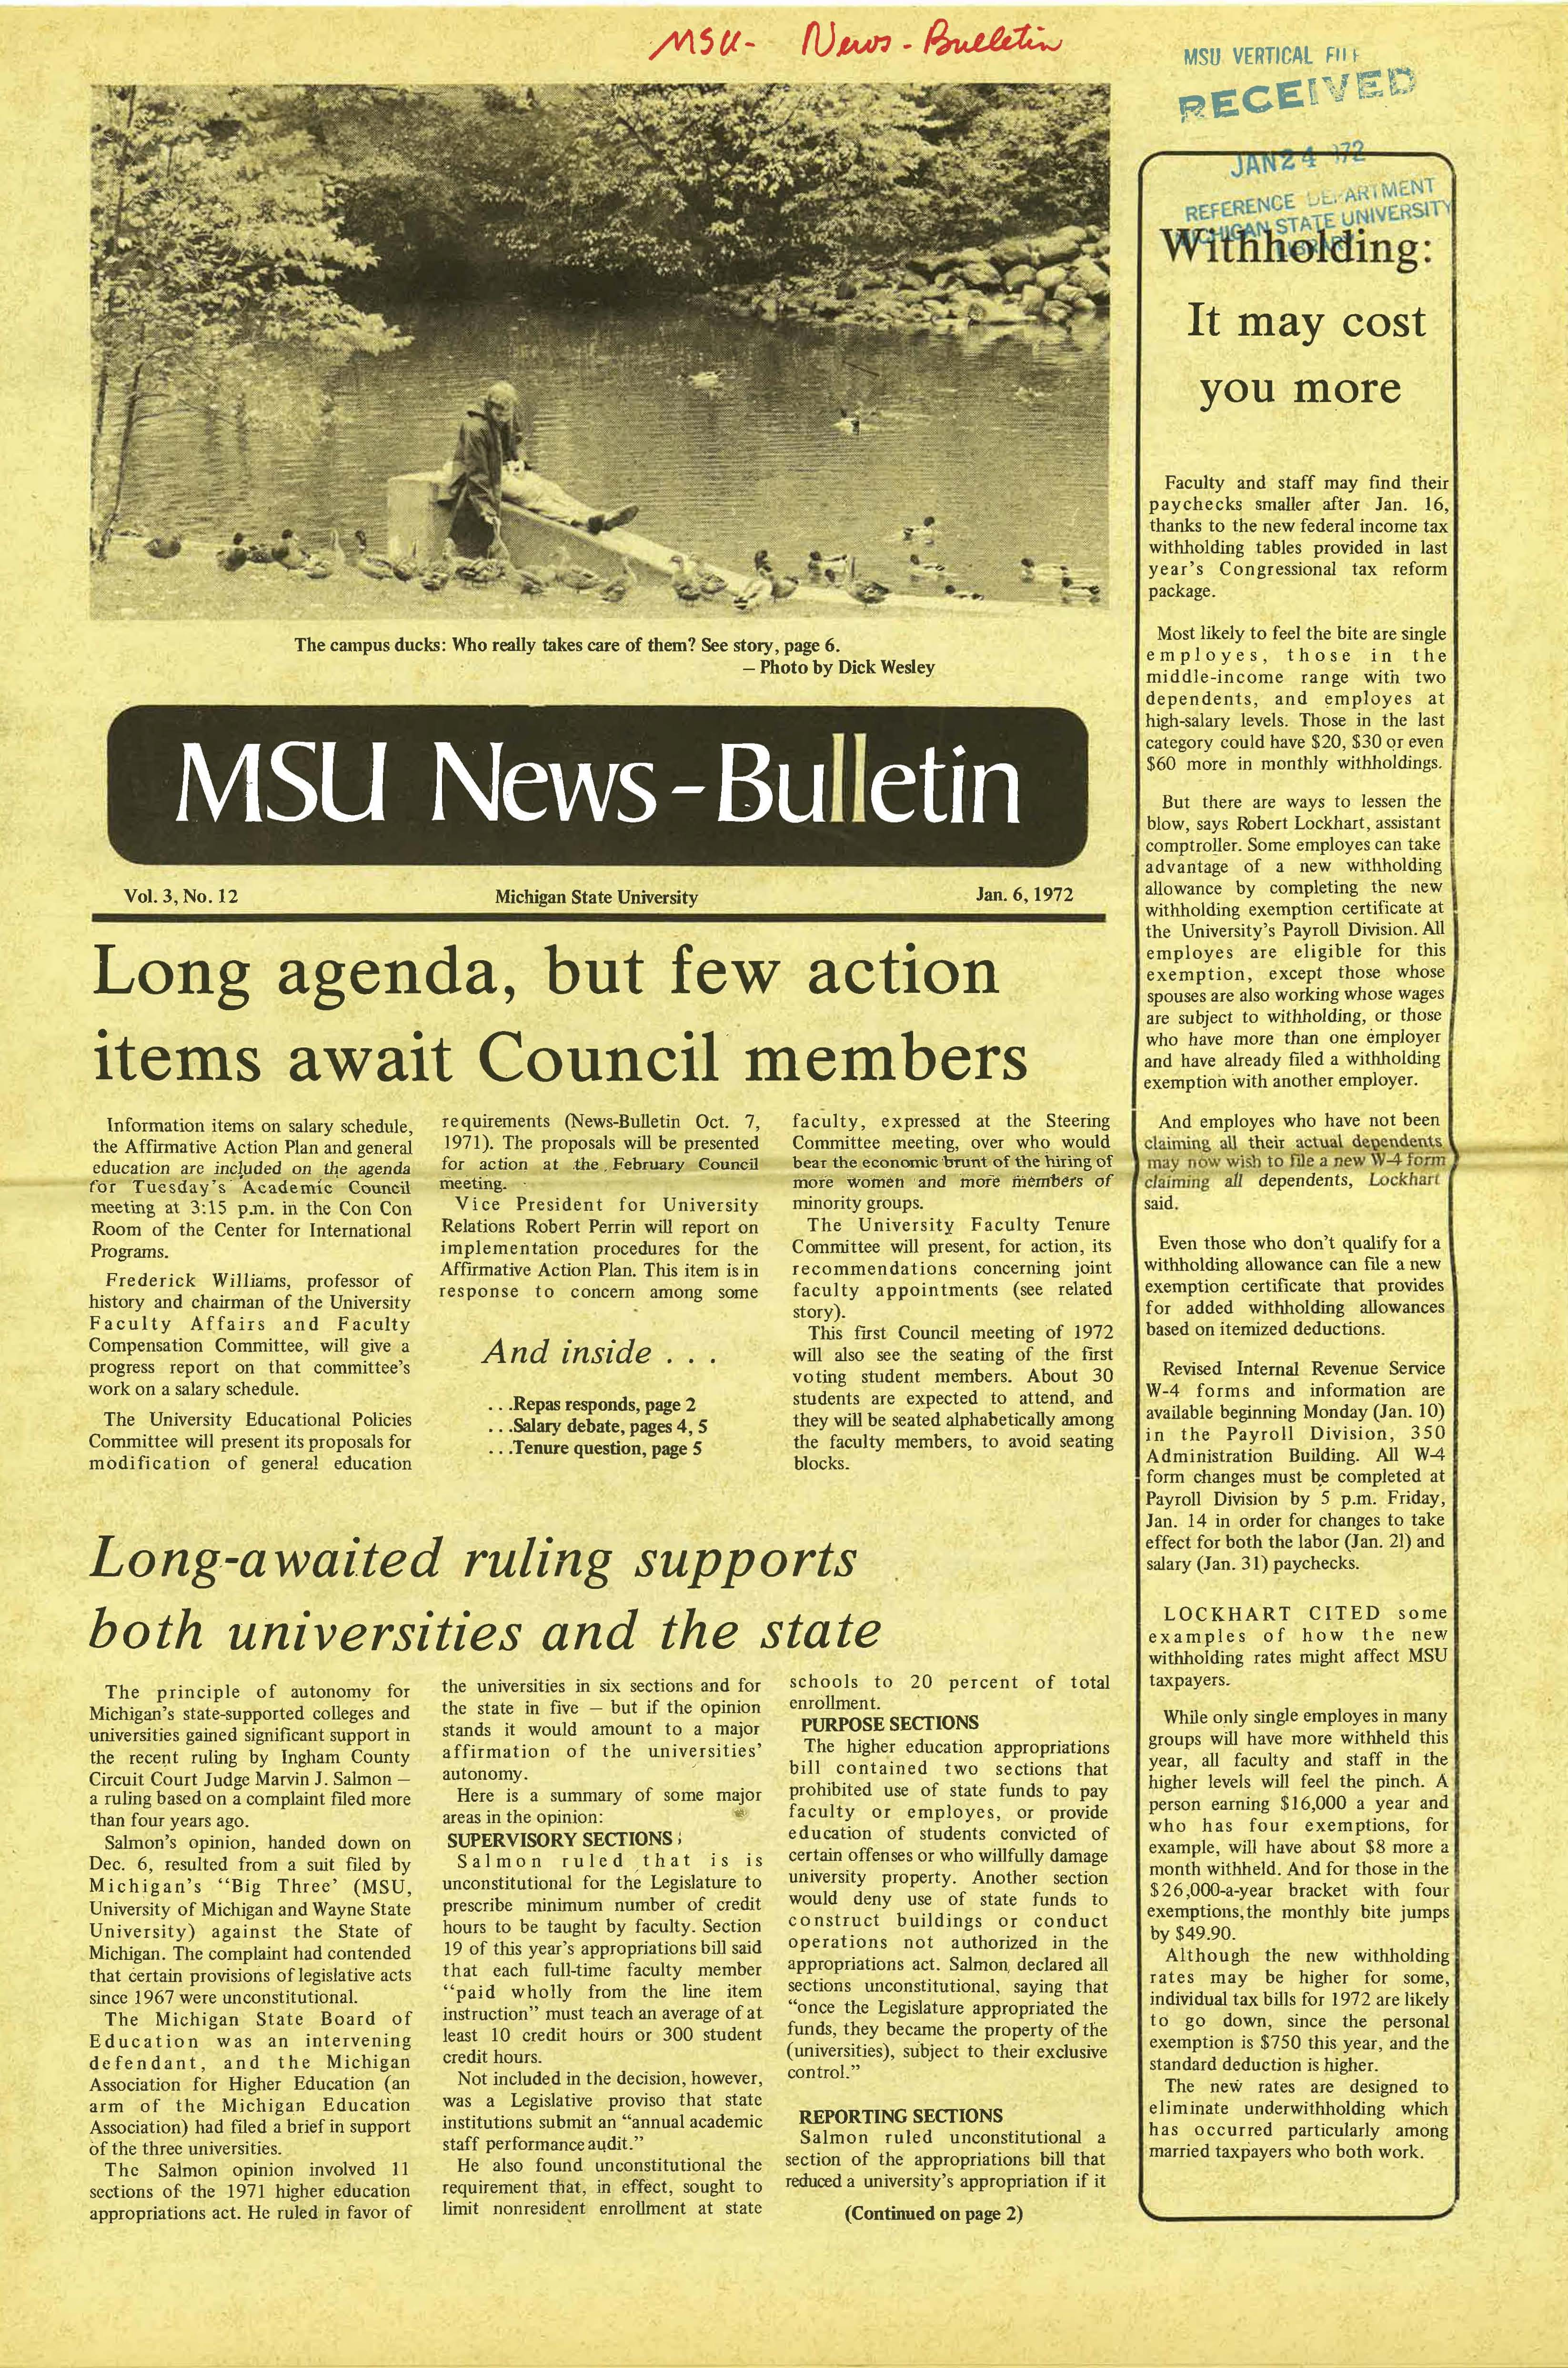 MSU News Bulletin, vol. 4, No. 02, September 28, 1972